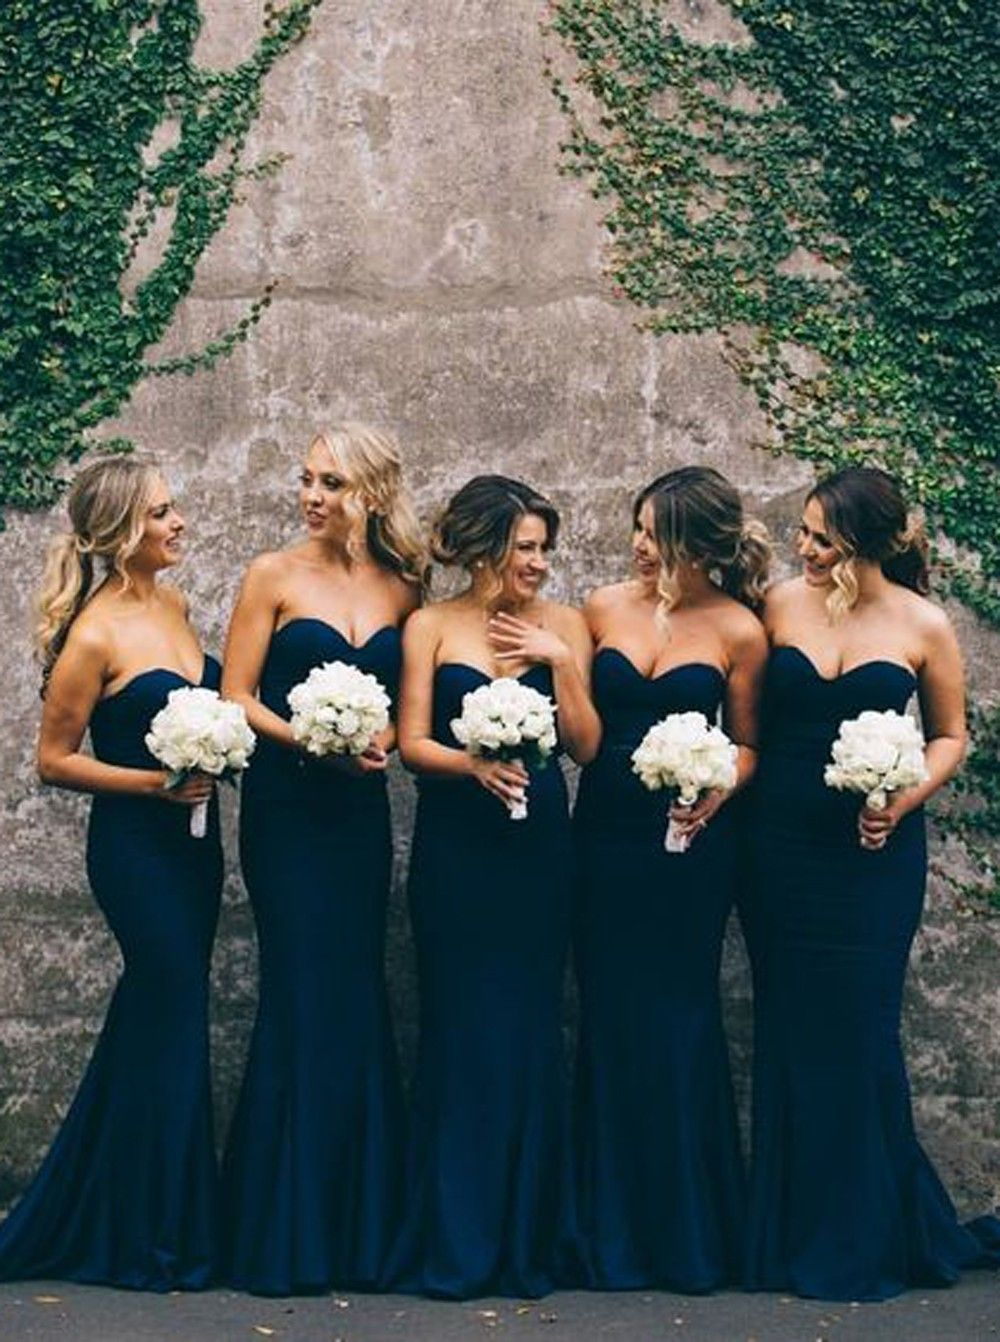 d634e718852 Buy Elegant Sweetheart Sweep Train Dark Navy Mermaid Bridesmaid Dress  Default Category under US  108.99 only in SimpleDress.